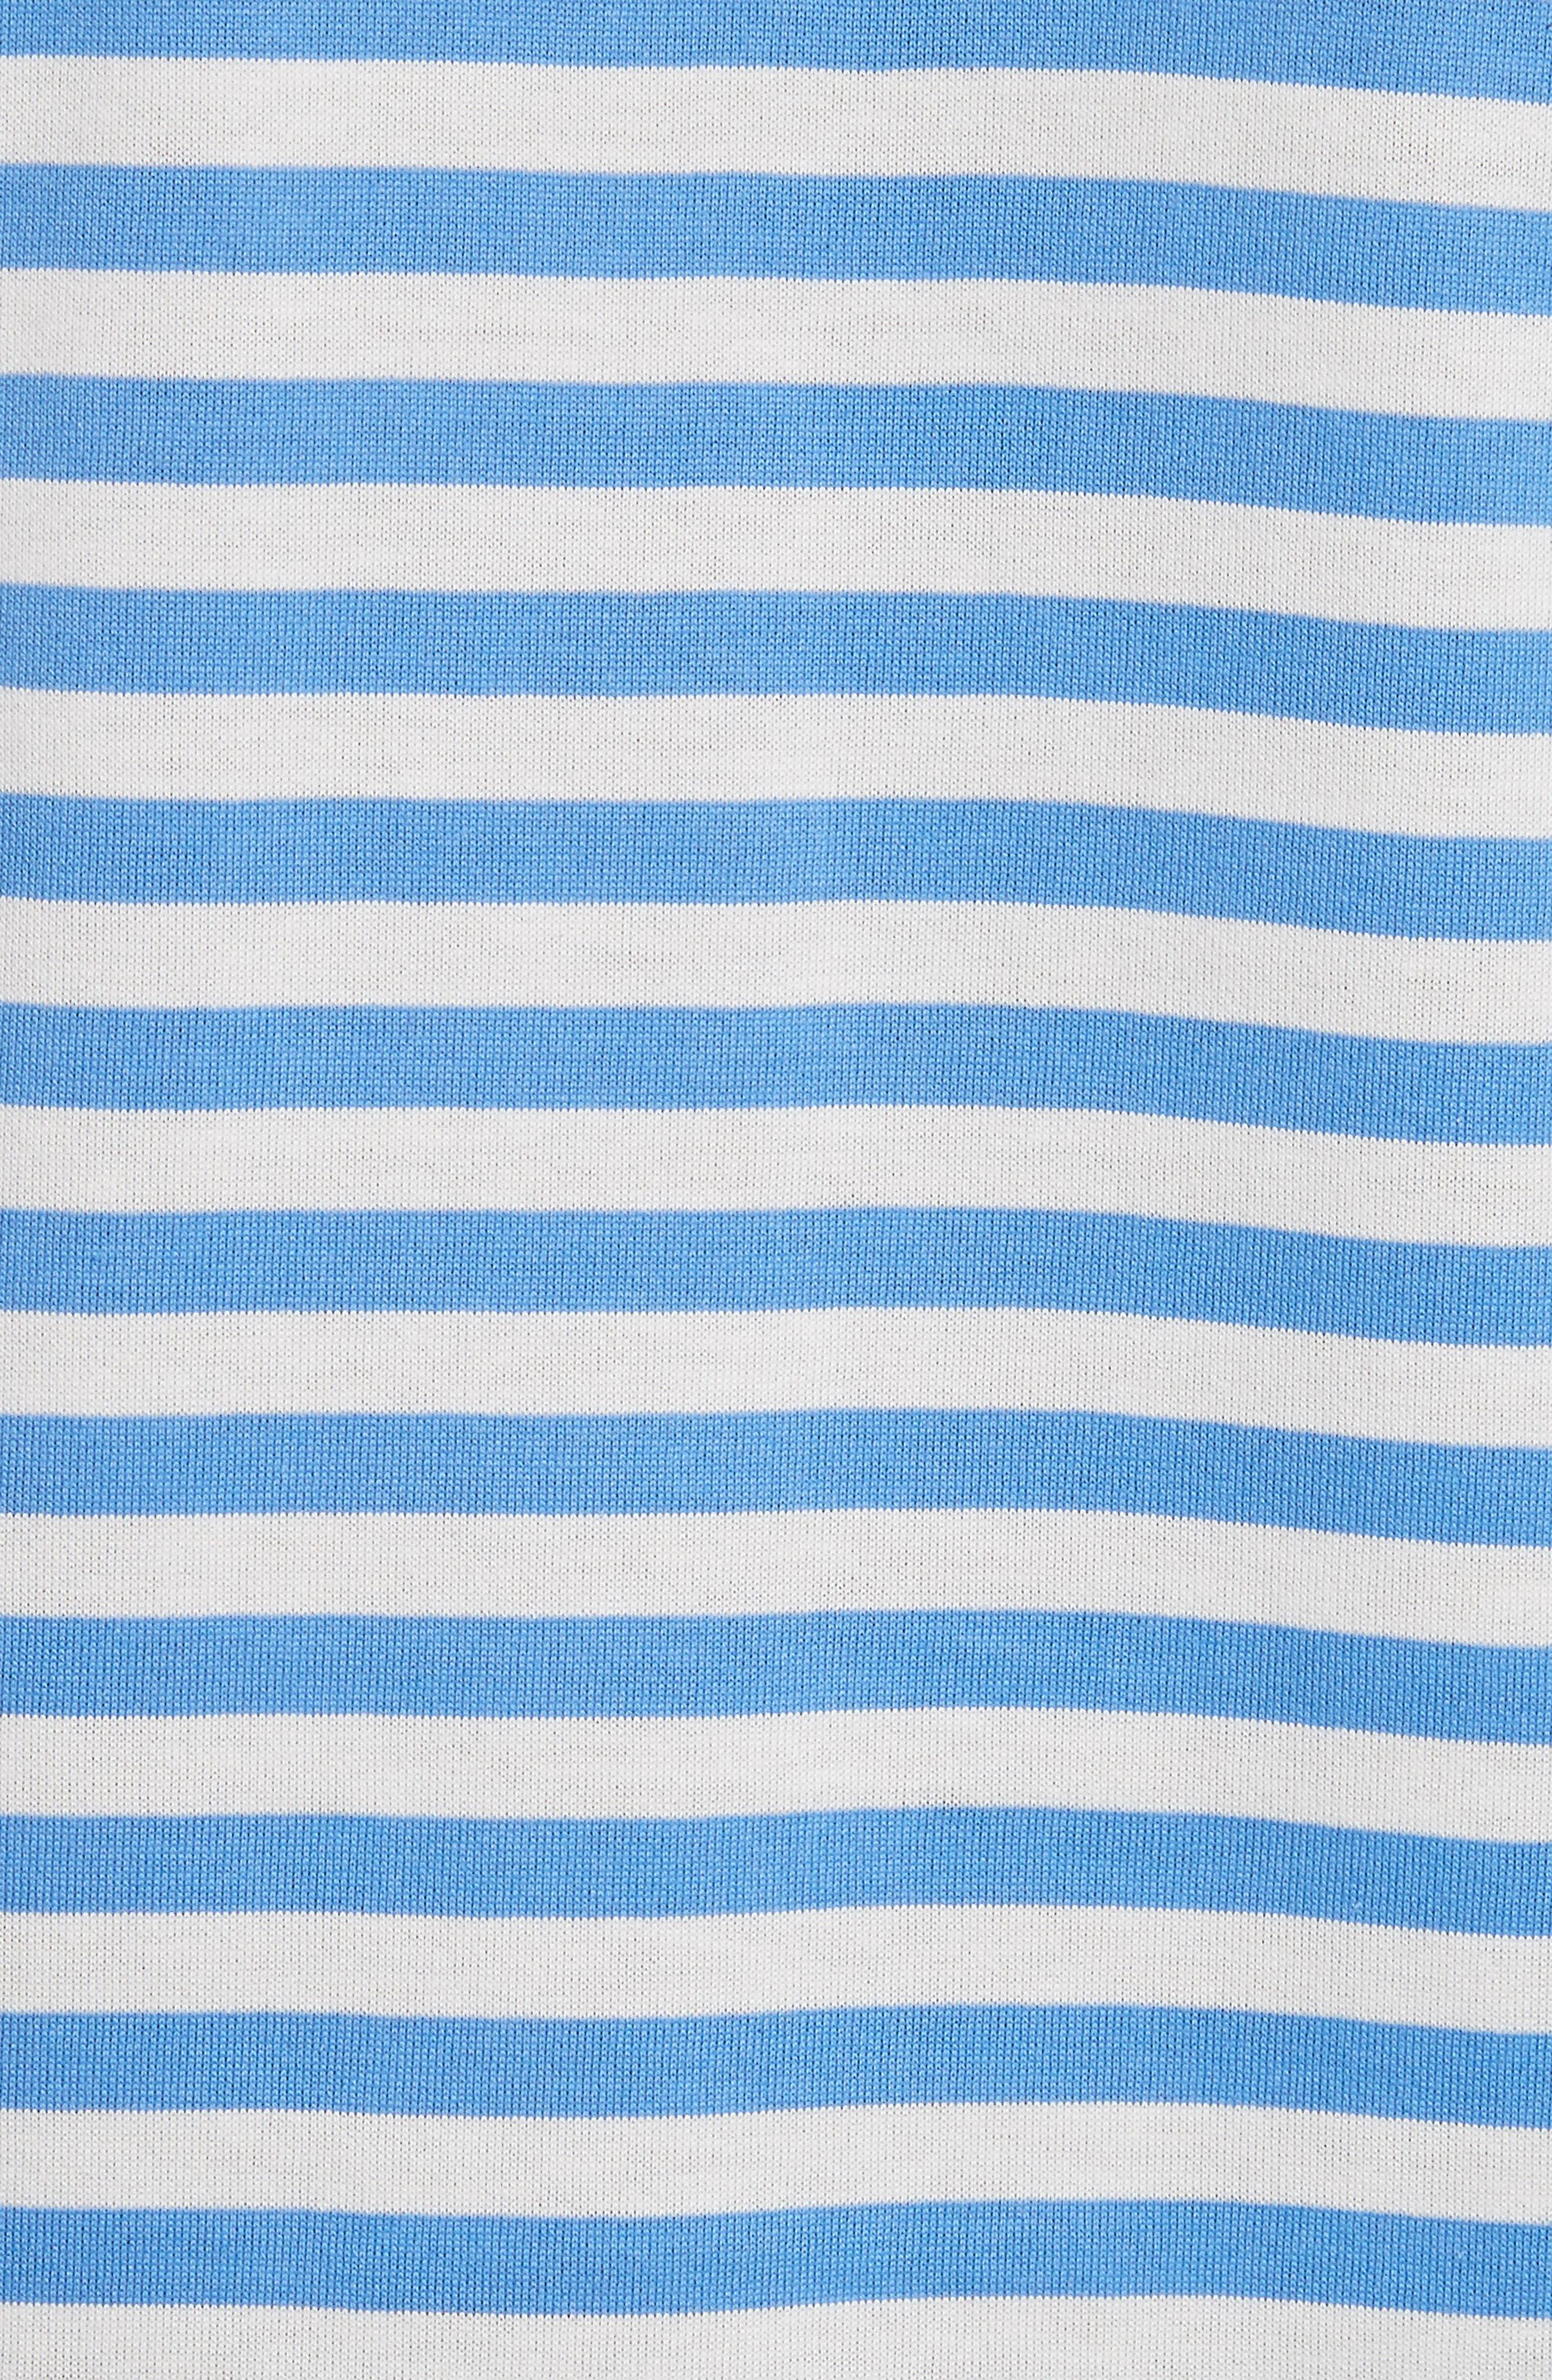 Long Sleeve Stripe Crewneck T-Shirt,                             Alternate thumbnail 5, color,                             BLUE